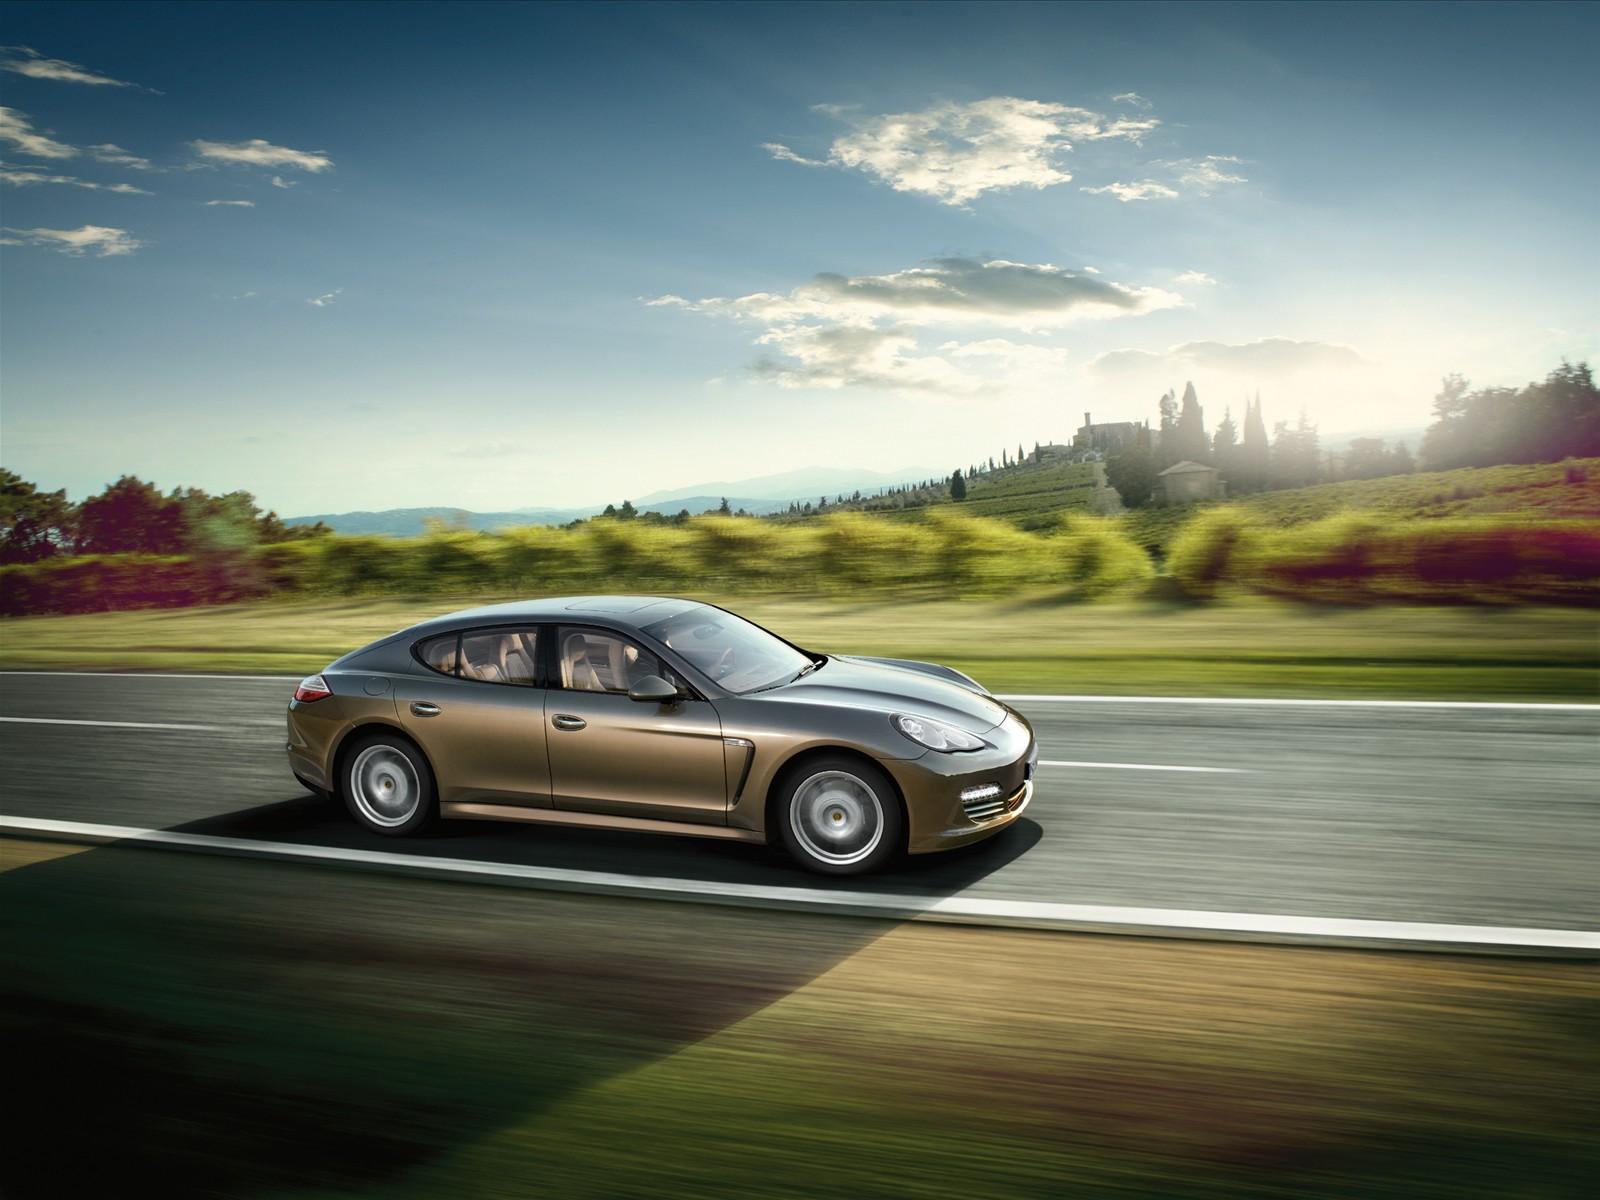 http://3.bp.blogspot.com/_L7TBxp3i-_I/TTbJNRnhHZI/AAAAAAAABKQ/Q1mvIGFg5xQ/s1600/Porsche+Panamera+V6+2011+wallpaper.jpg